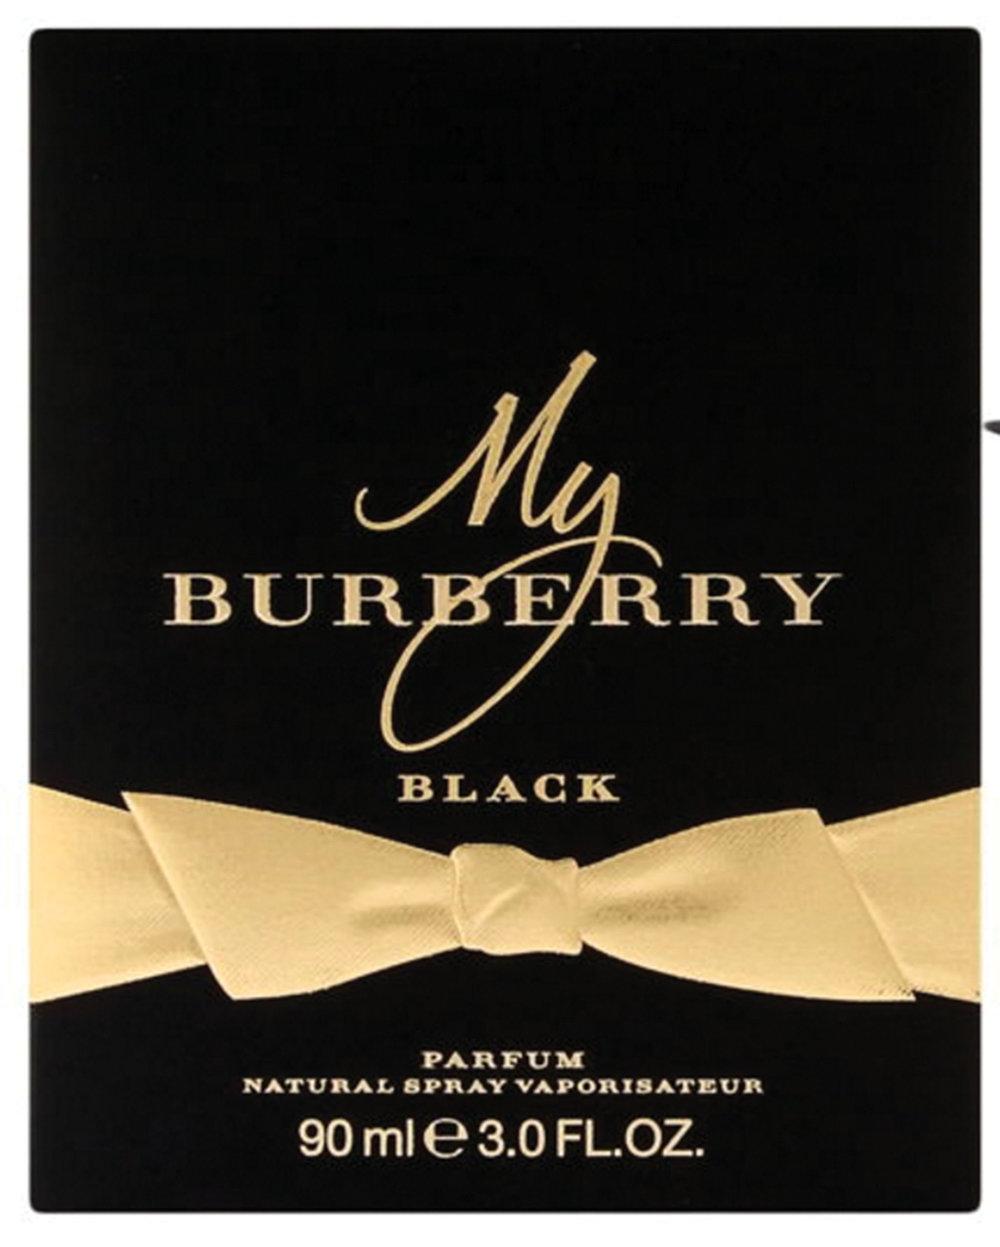 8.Burberry 香水 $138, burberry.ca